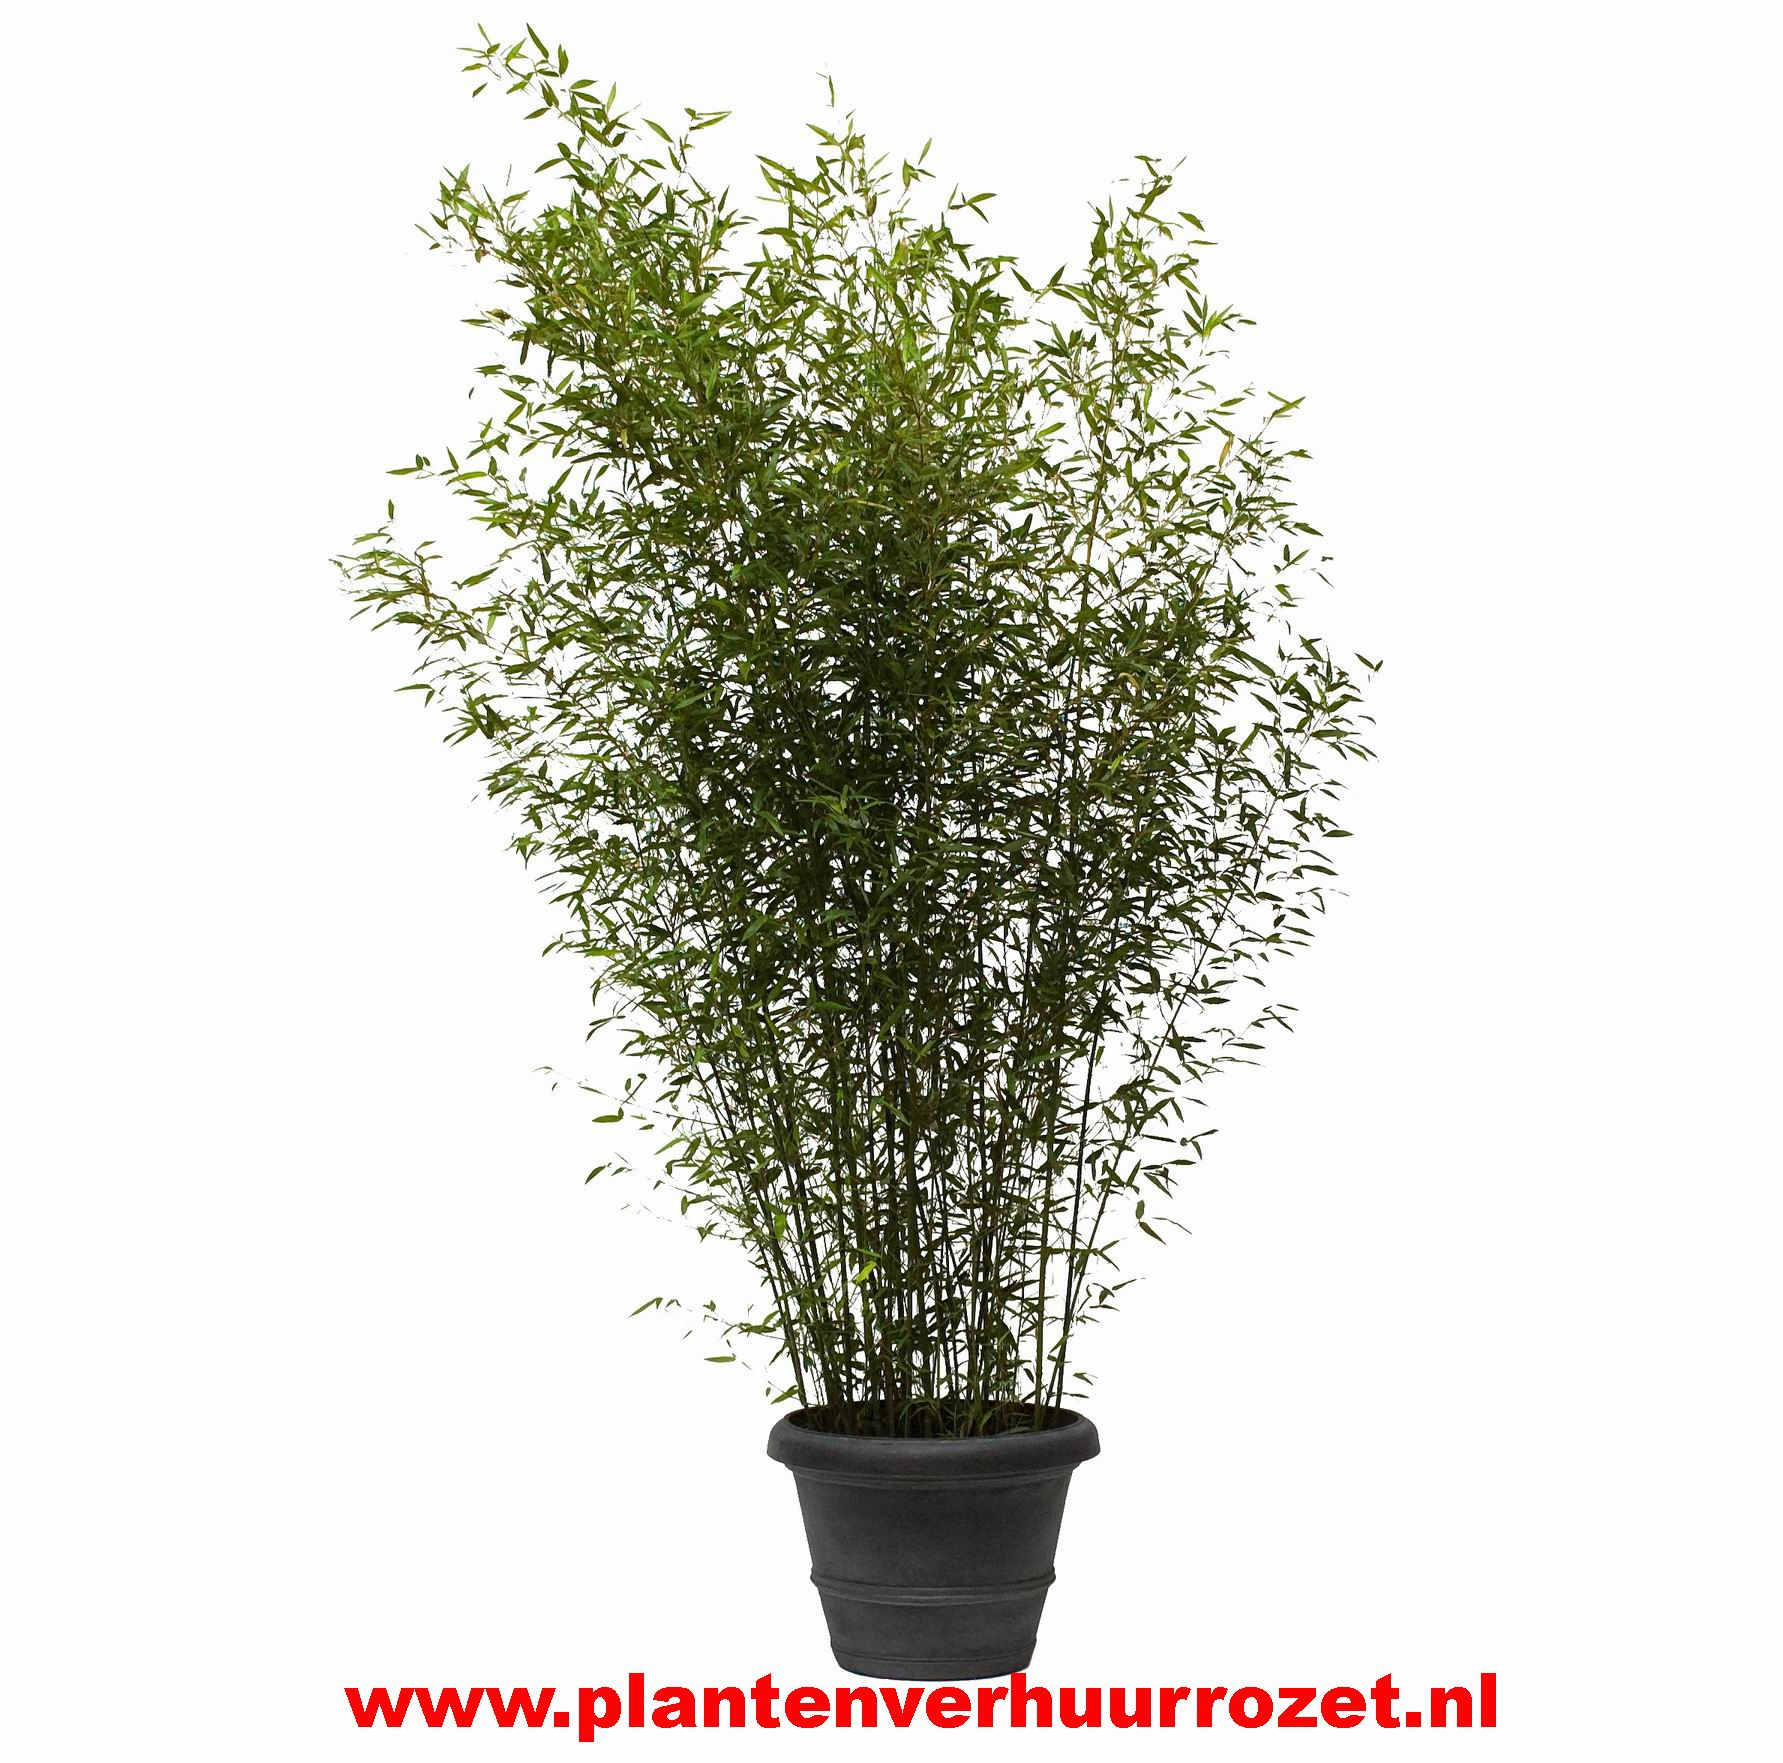 Bamboe planten   Plantenverhuur Rozet   Plantenverhuur Rozet